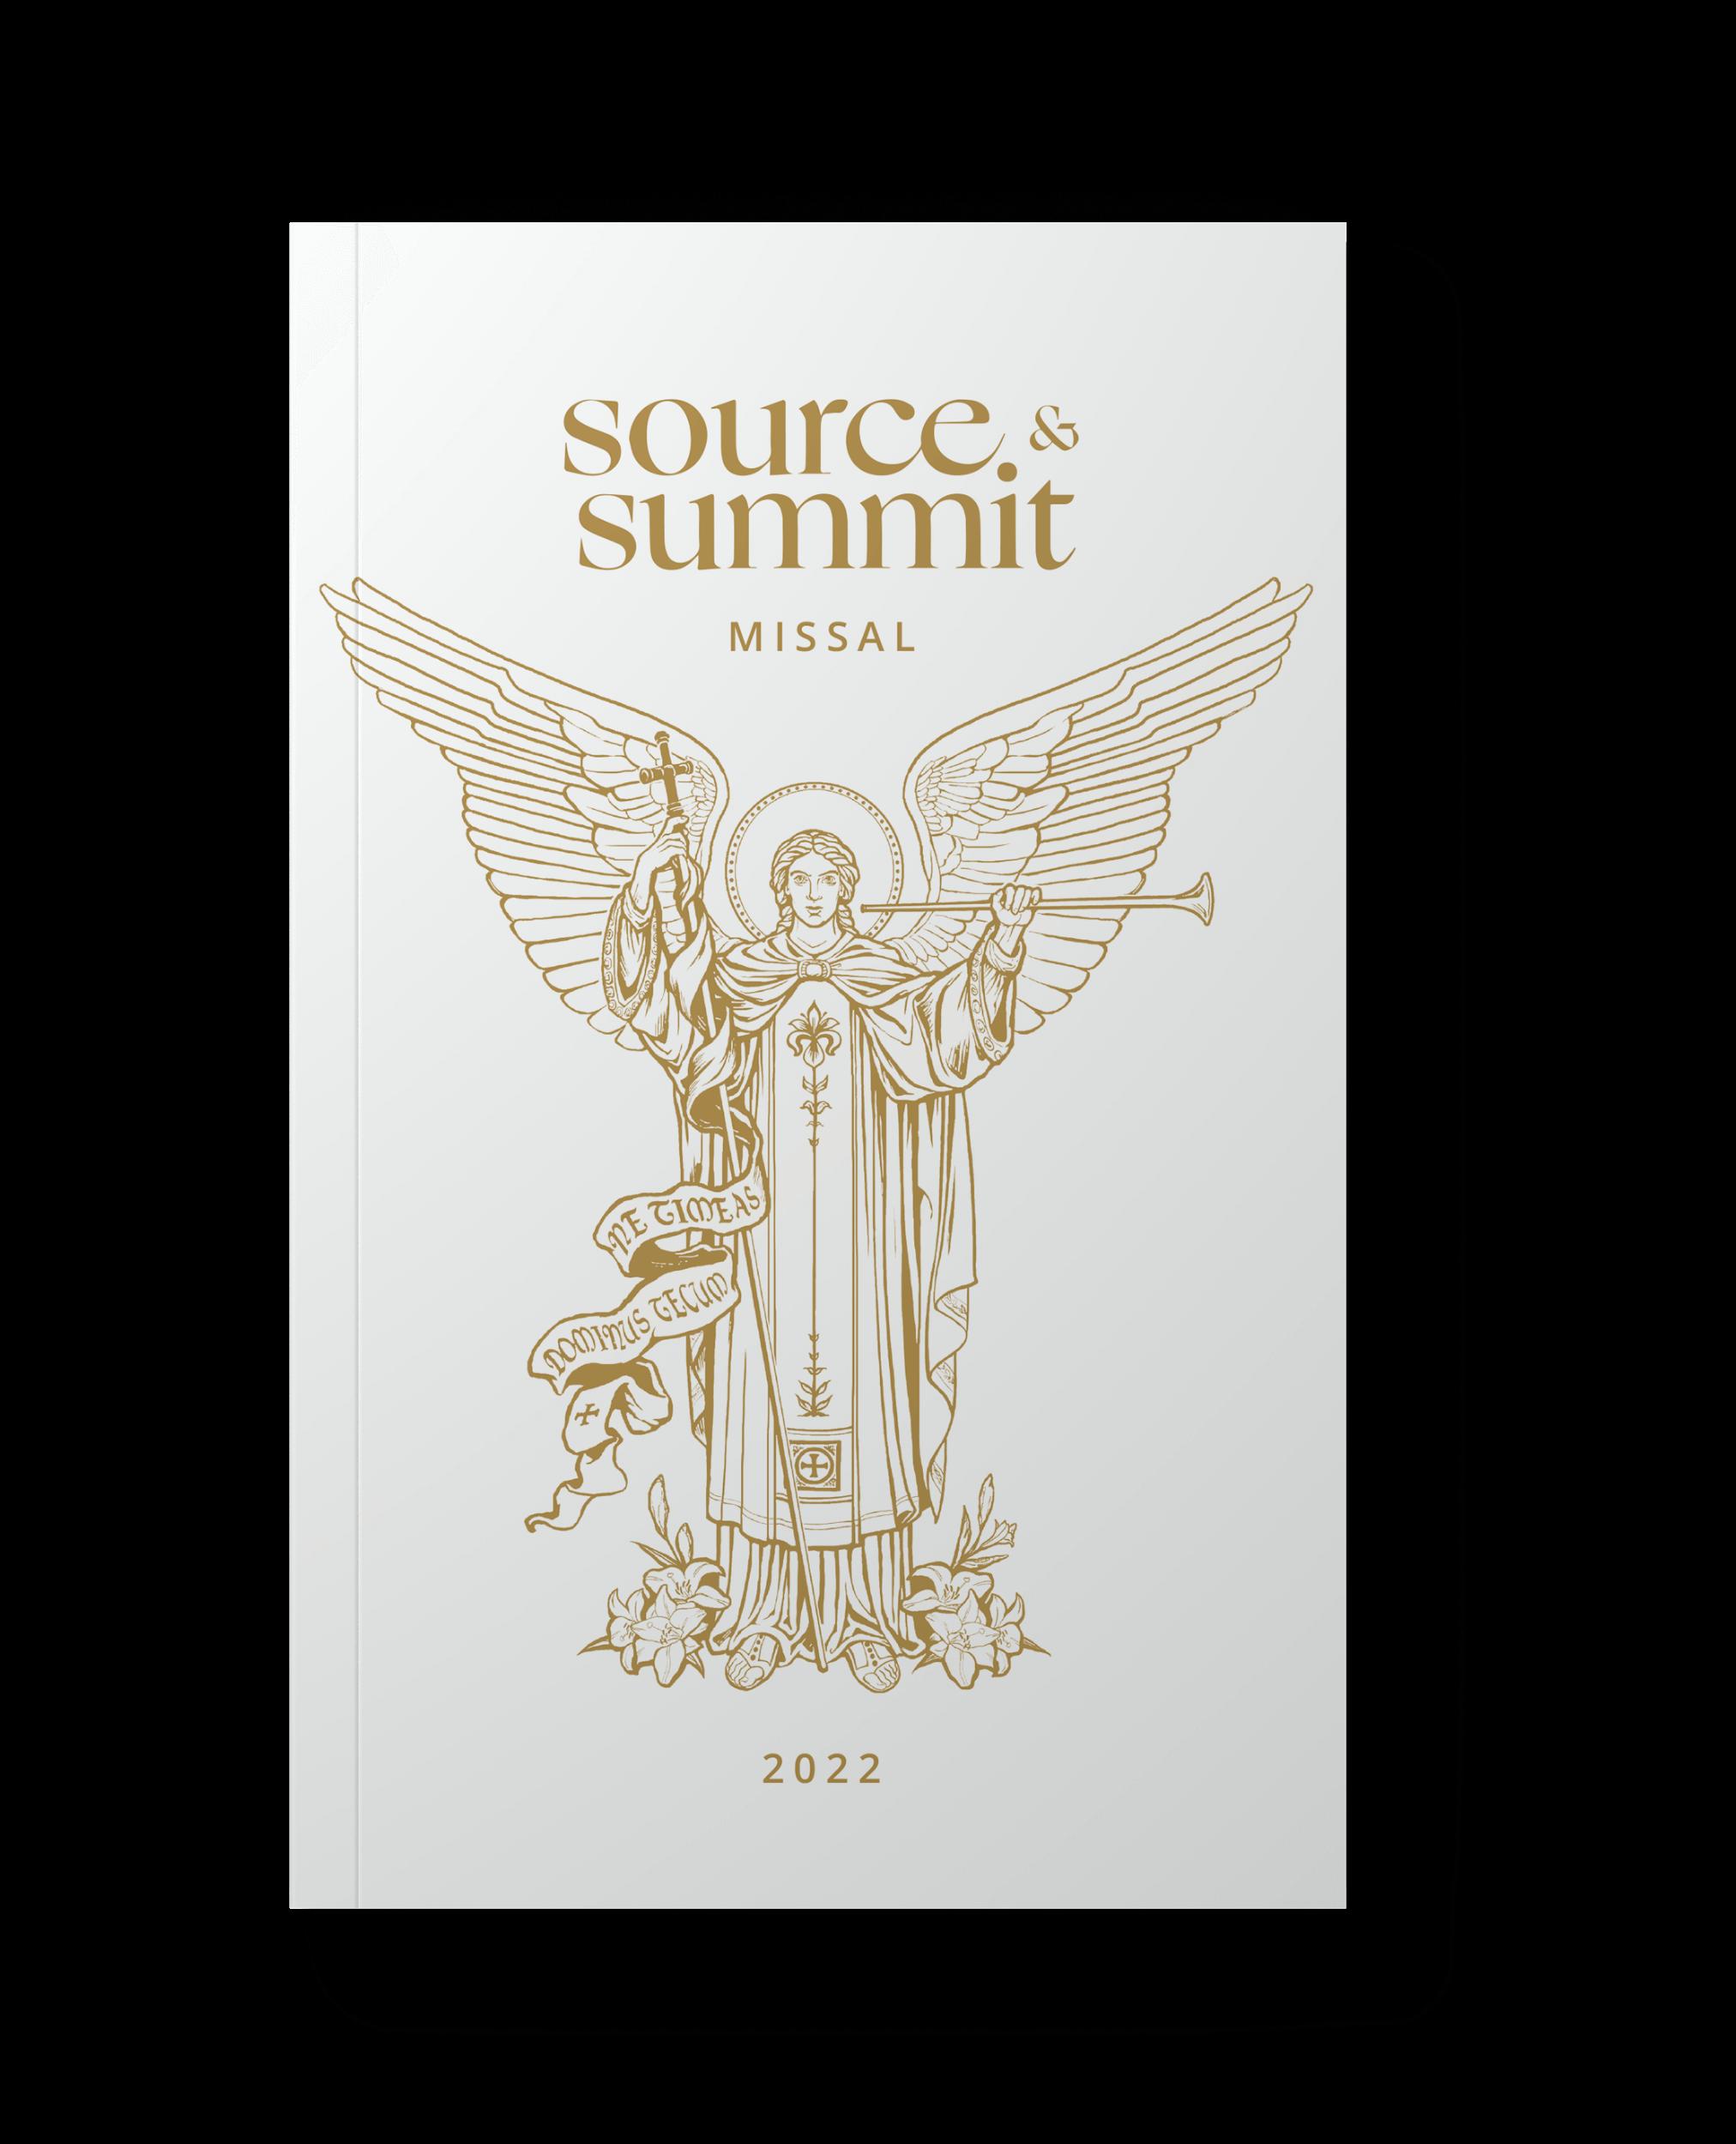 The 2022 Source & Summit Missal